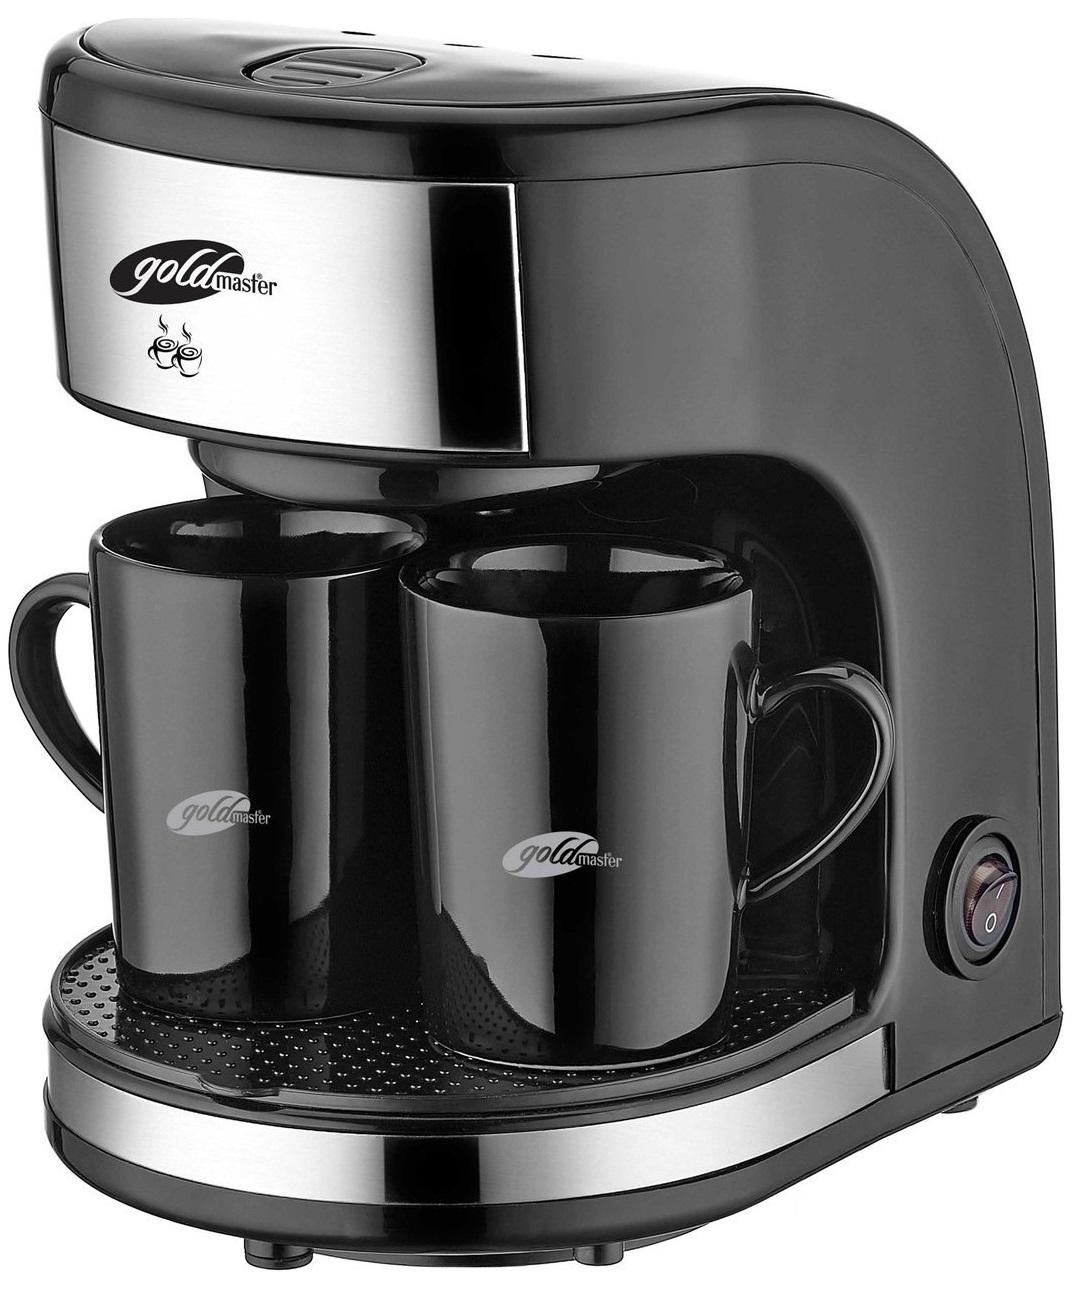 Goldmaster - Goldmaster GM-7331 Zinde Mini Filtre Kahve Makinesi